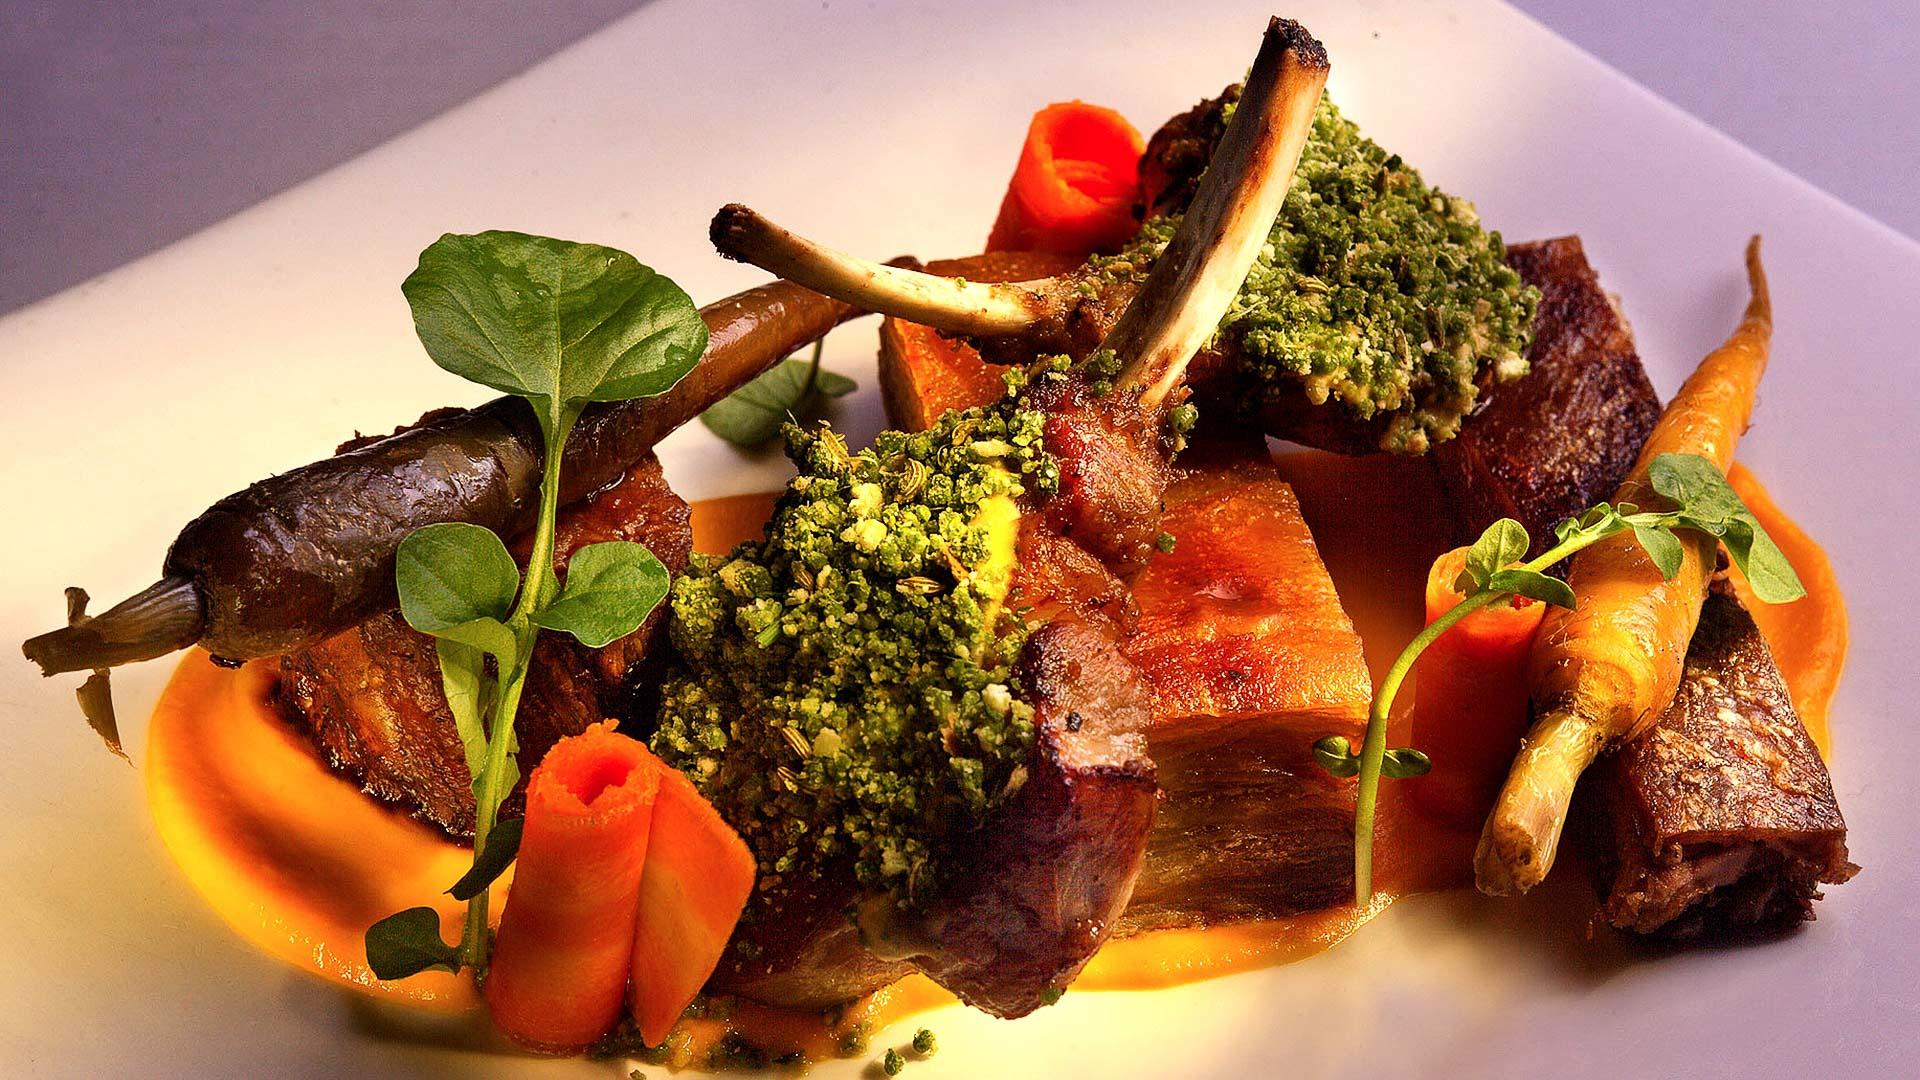 commercial-photography-restaurant-lamb-ireland